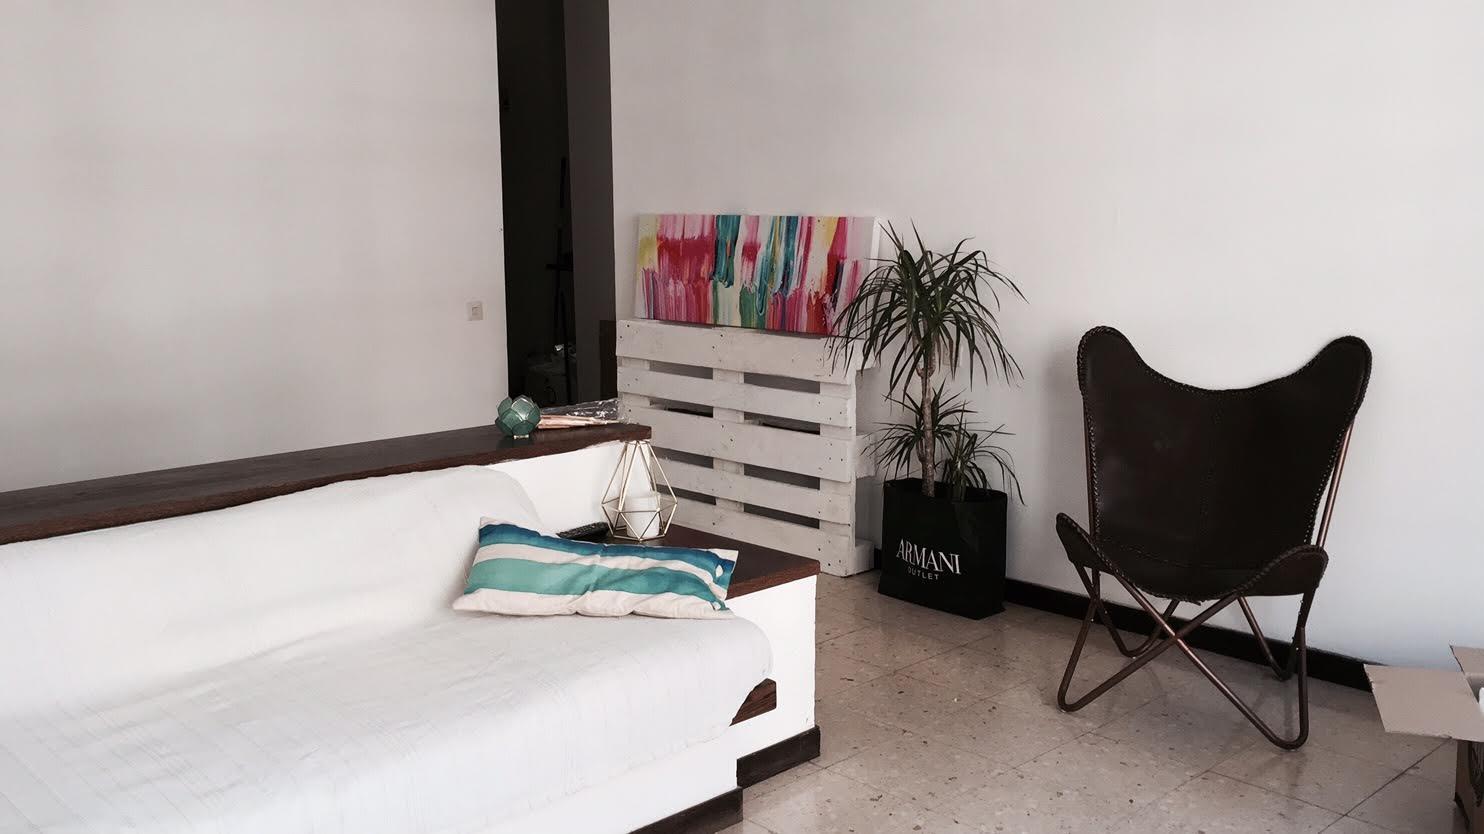 5_Aloha_Home_blogger_deco_barcelona_theguestgirl_and_mrk_kilian_sevilla_laura_santolaria